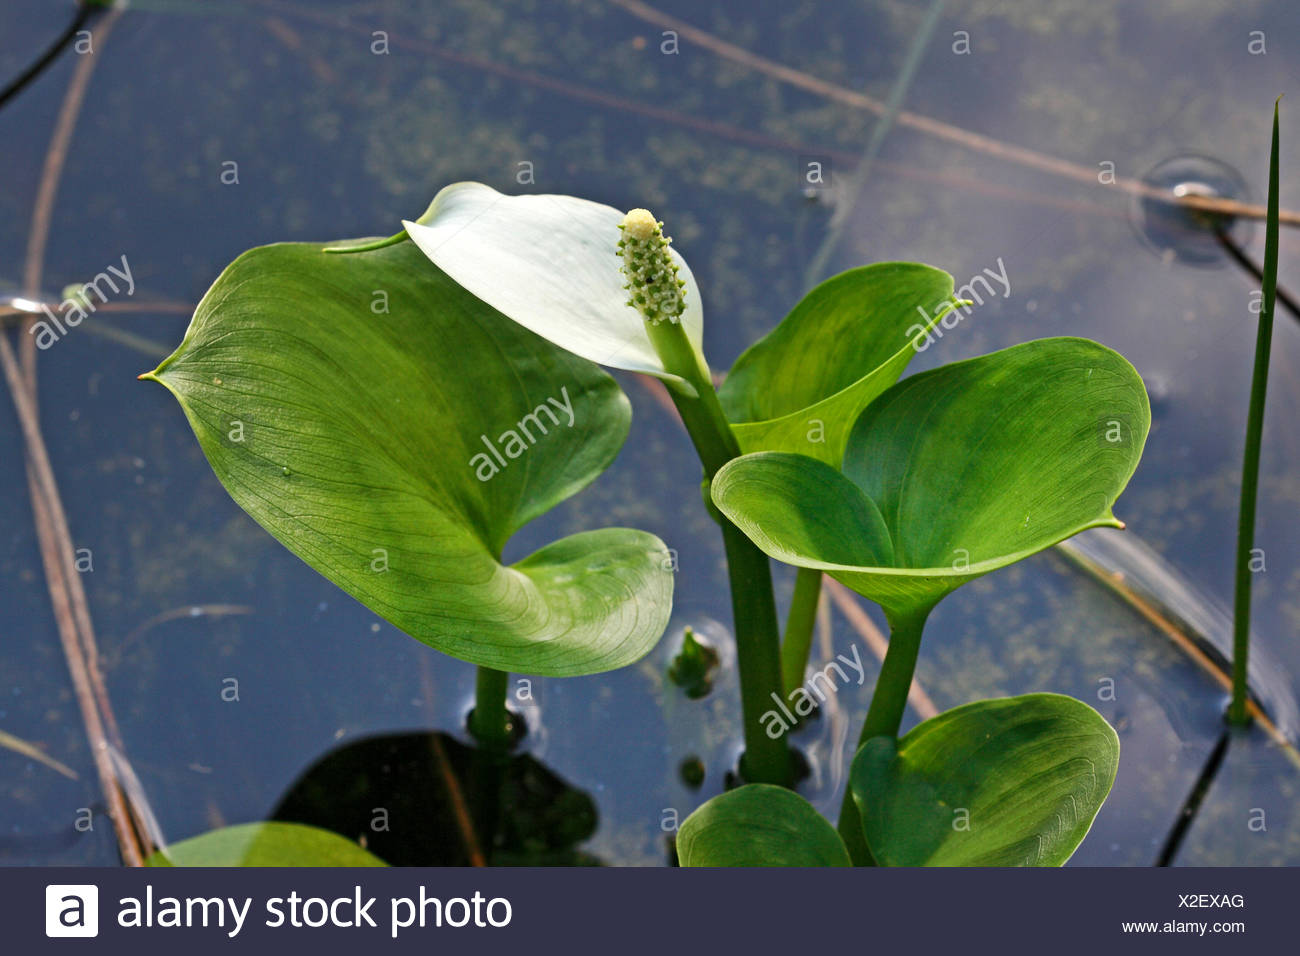 bog arum, wild calla (Calla palustris), blooming, Germany - Stock Image